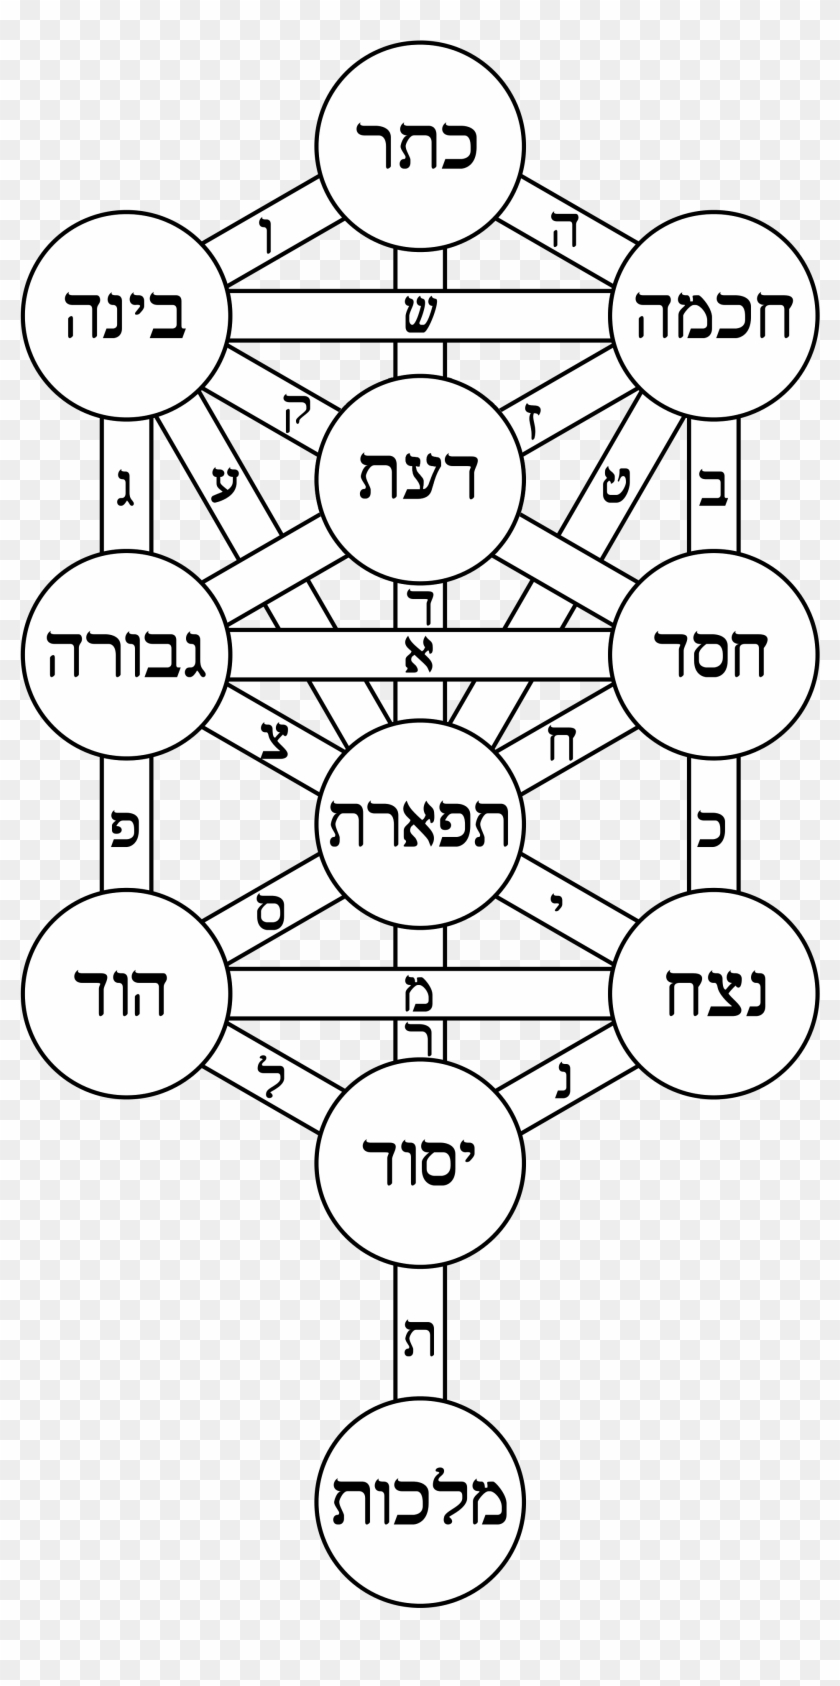 Tree Of Life Bahir Hebrew - Tree Of Life Sacred Geometry Clipart #86304